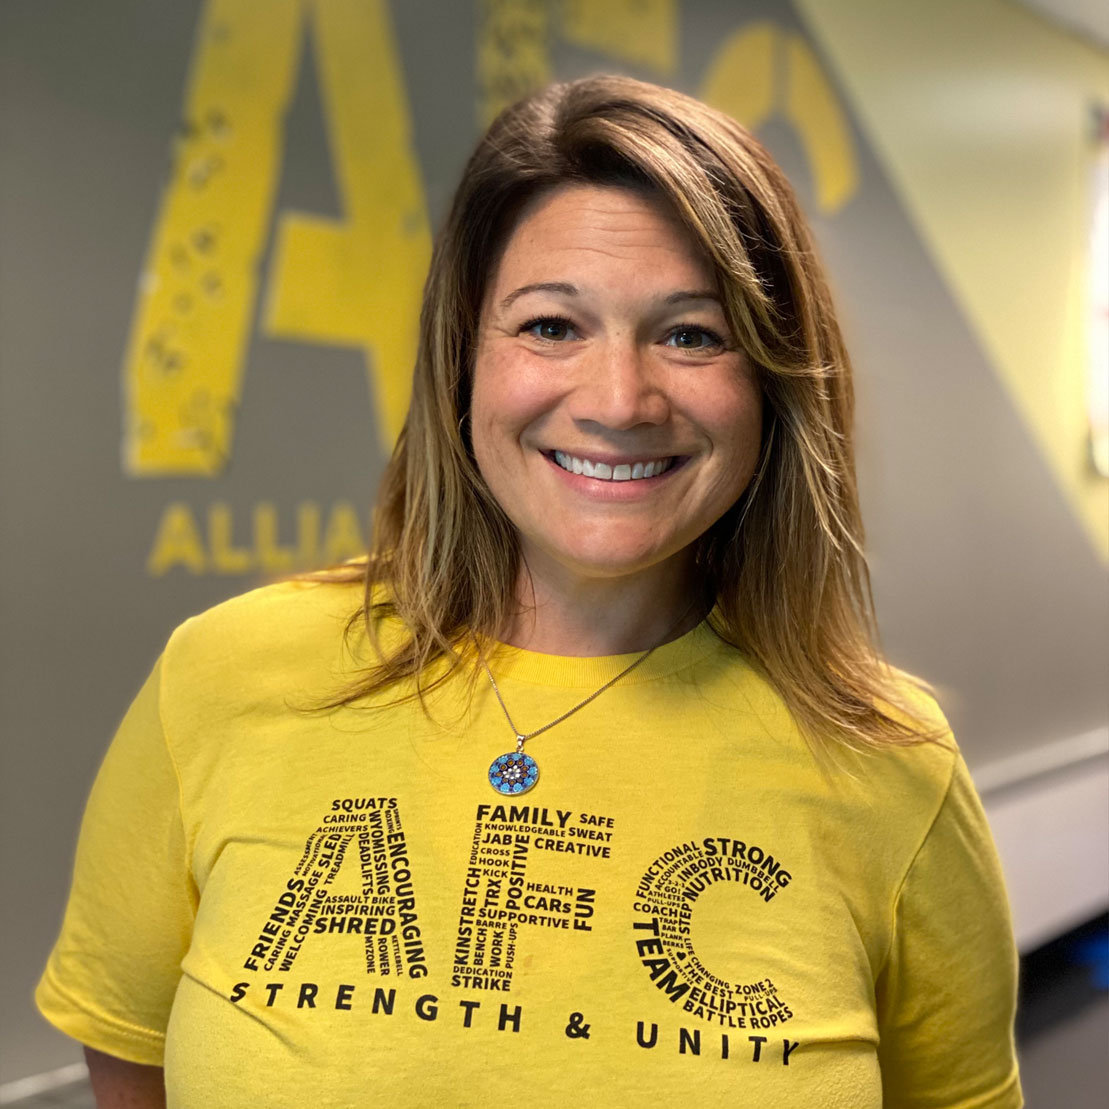 Claire Farrar Alliance Fitness Center